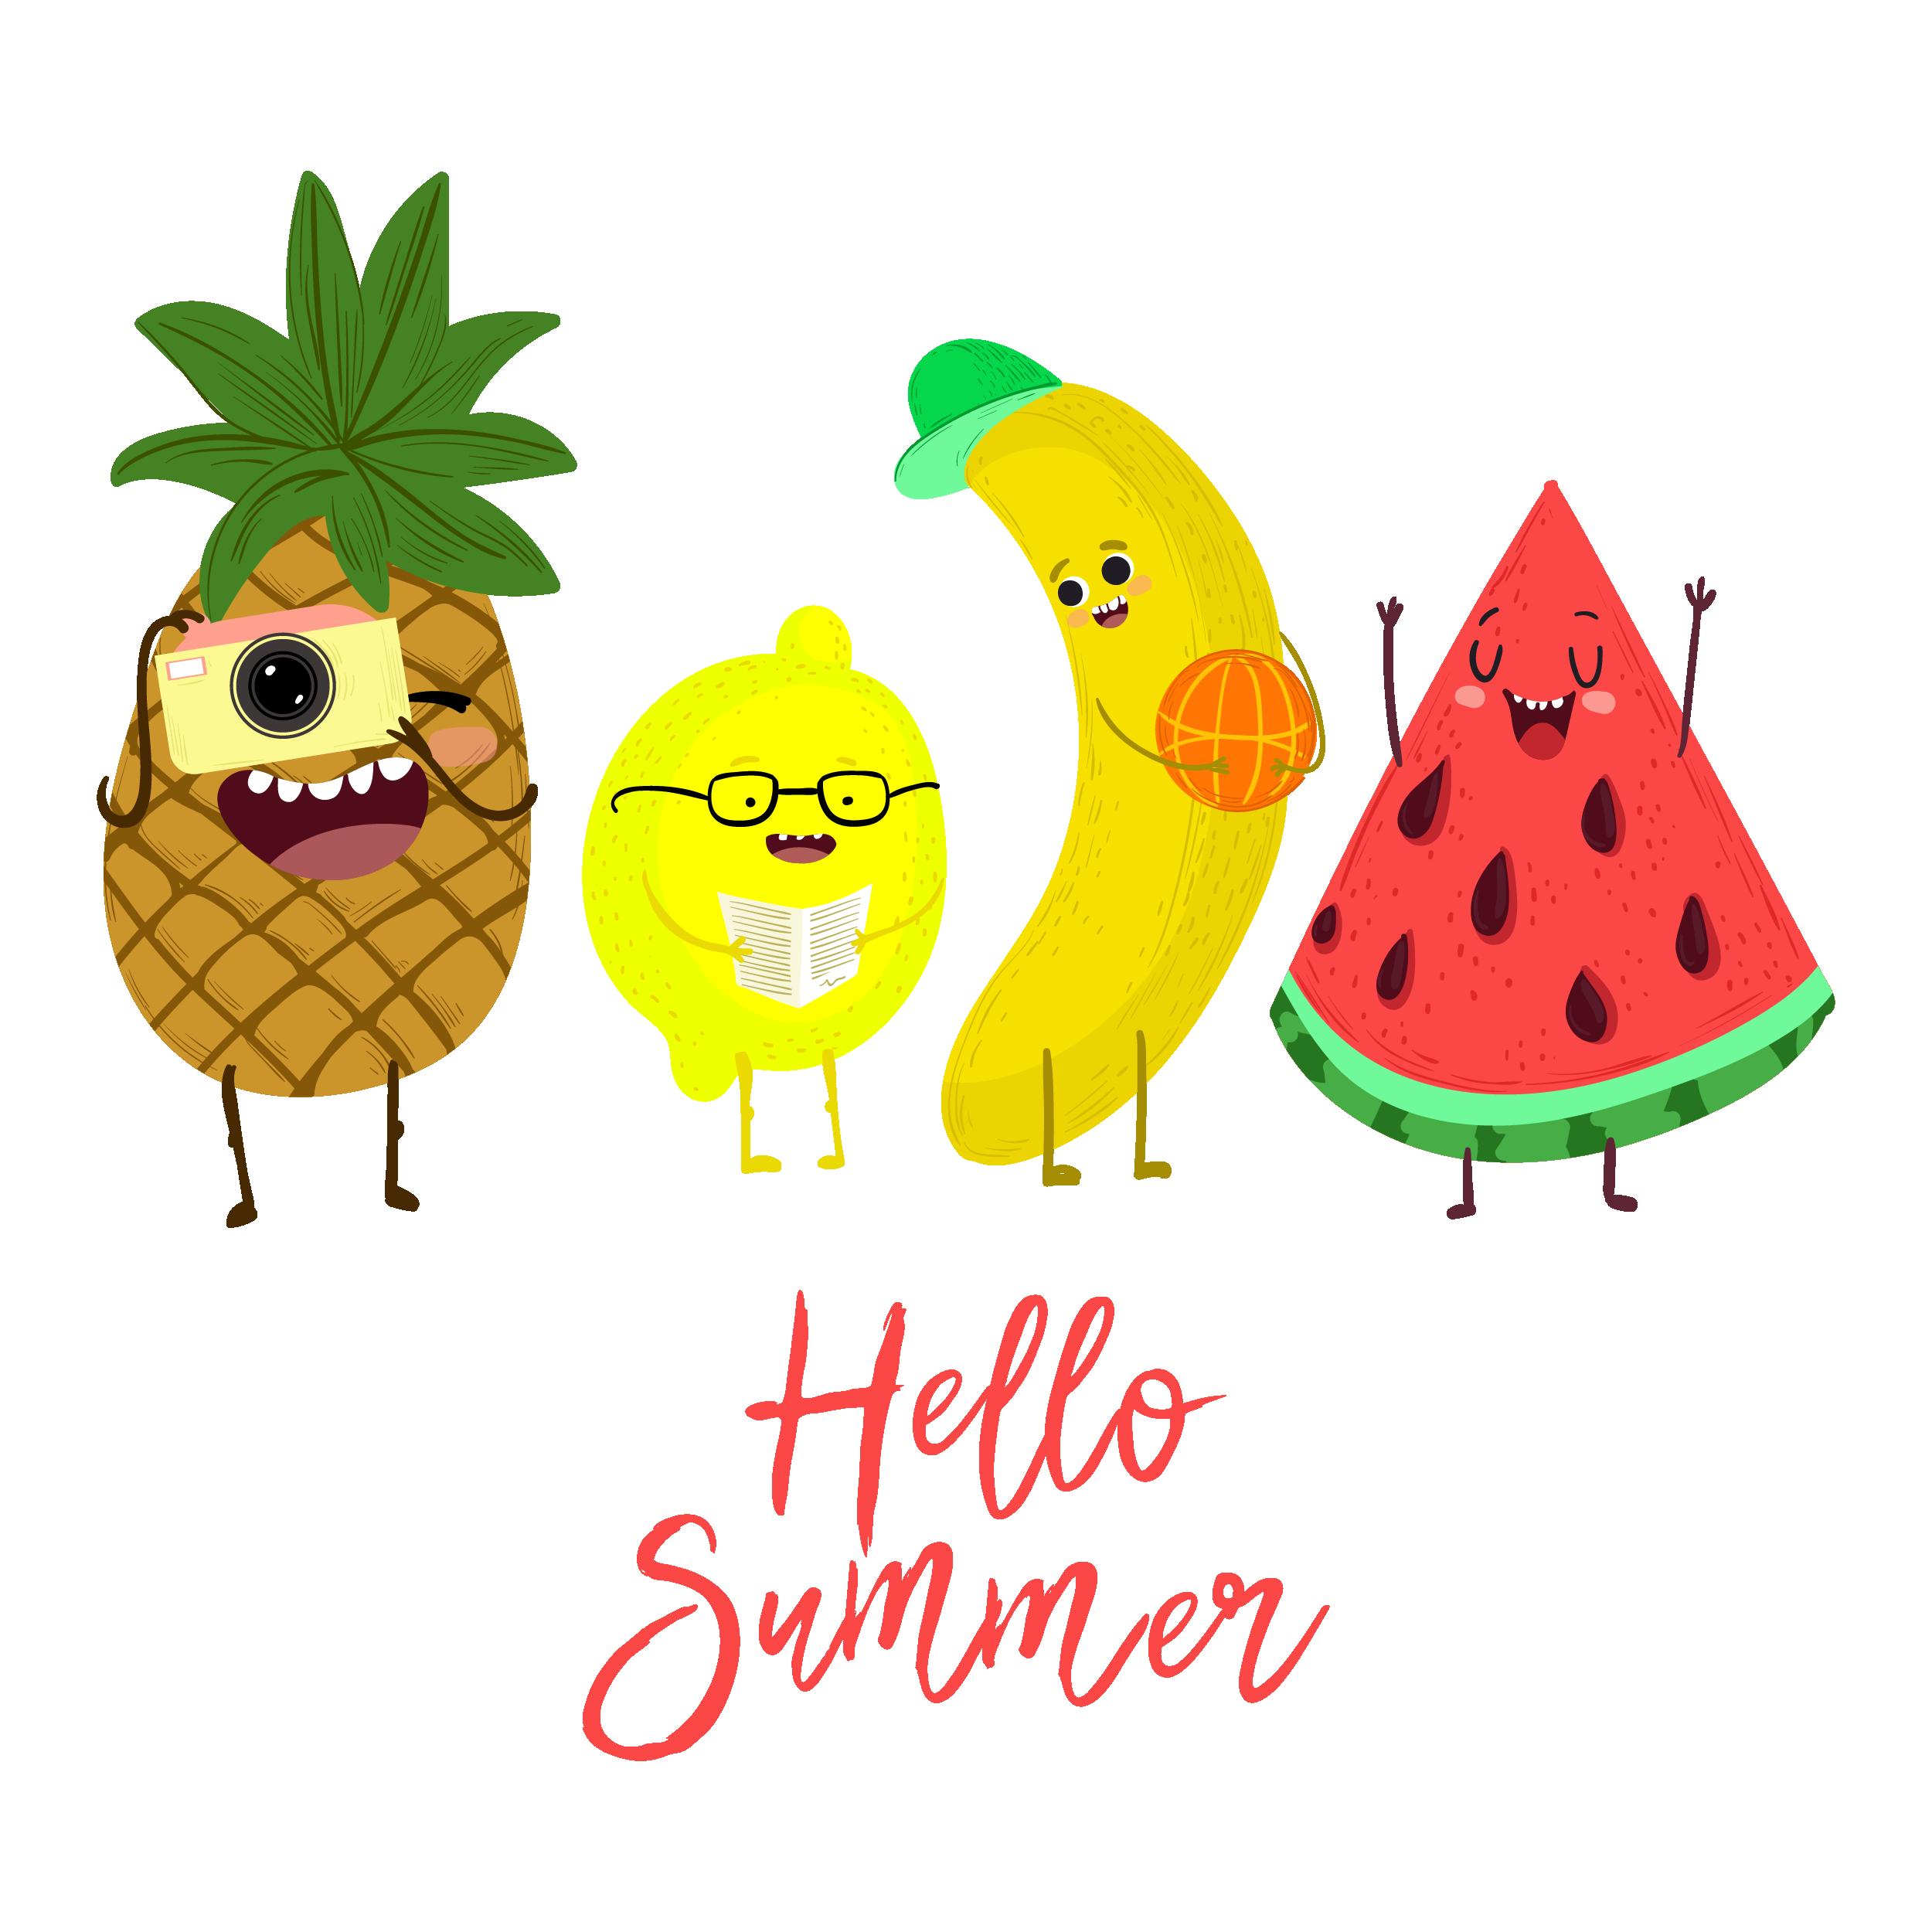 Pineapple clipart watermelon. Download summer cute creative